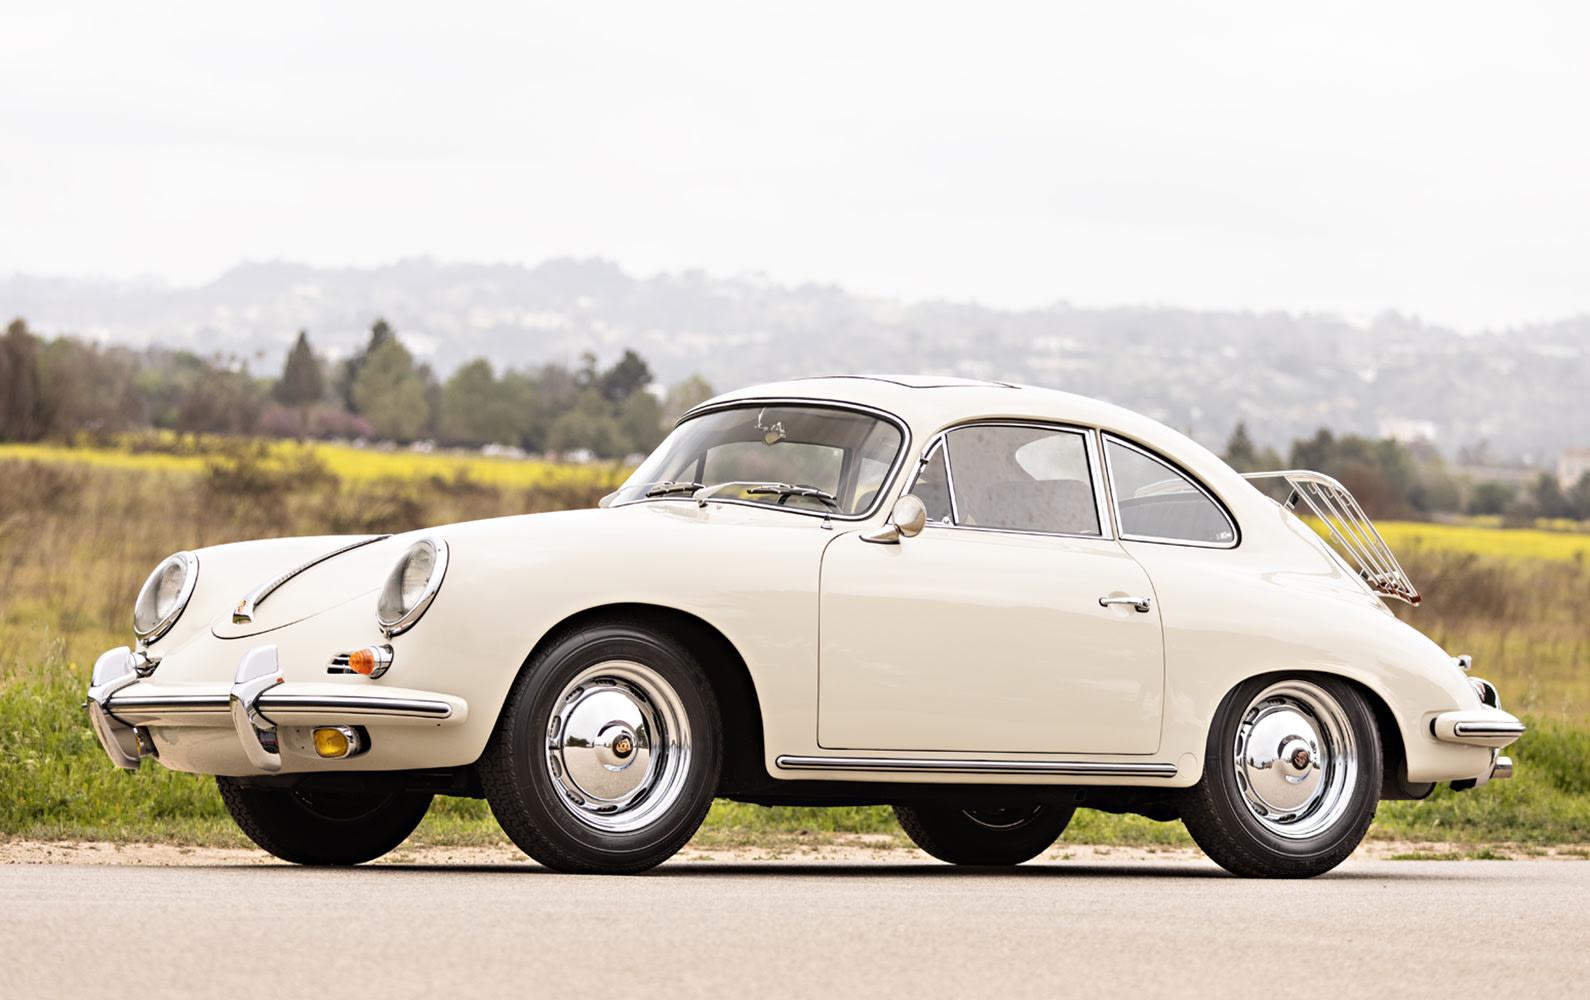 Prod/O21F - May 2021/1505_1961 Porsche 356 B Super Coupe/1961_Porsche_356_B_Super_Coupe_23_lgmqnn